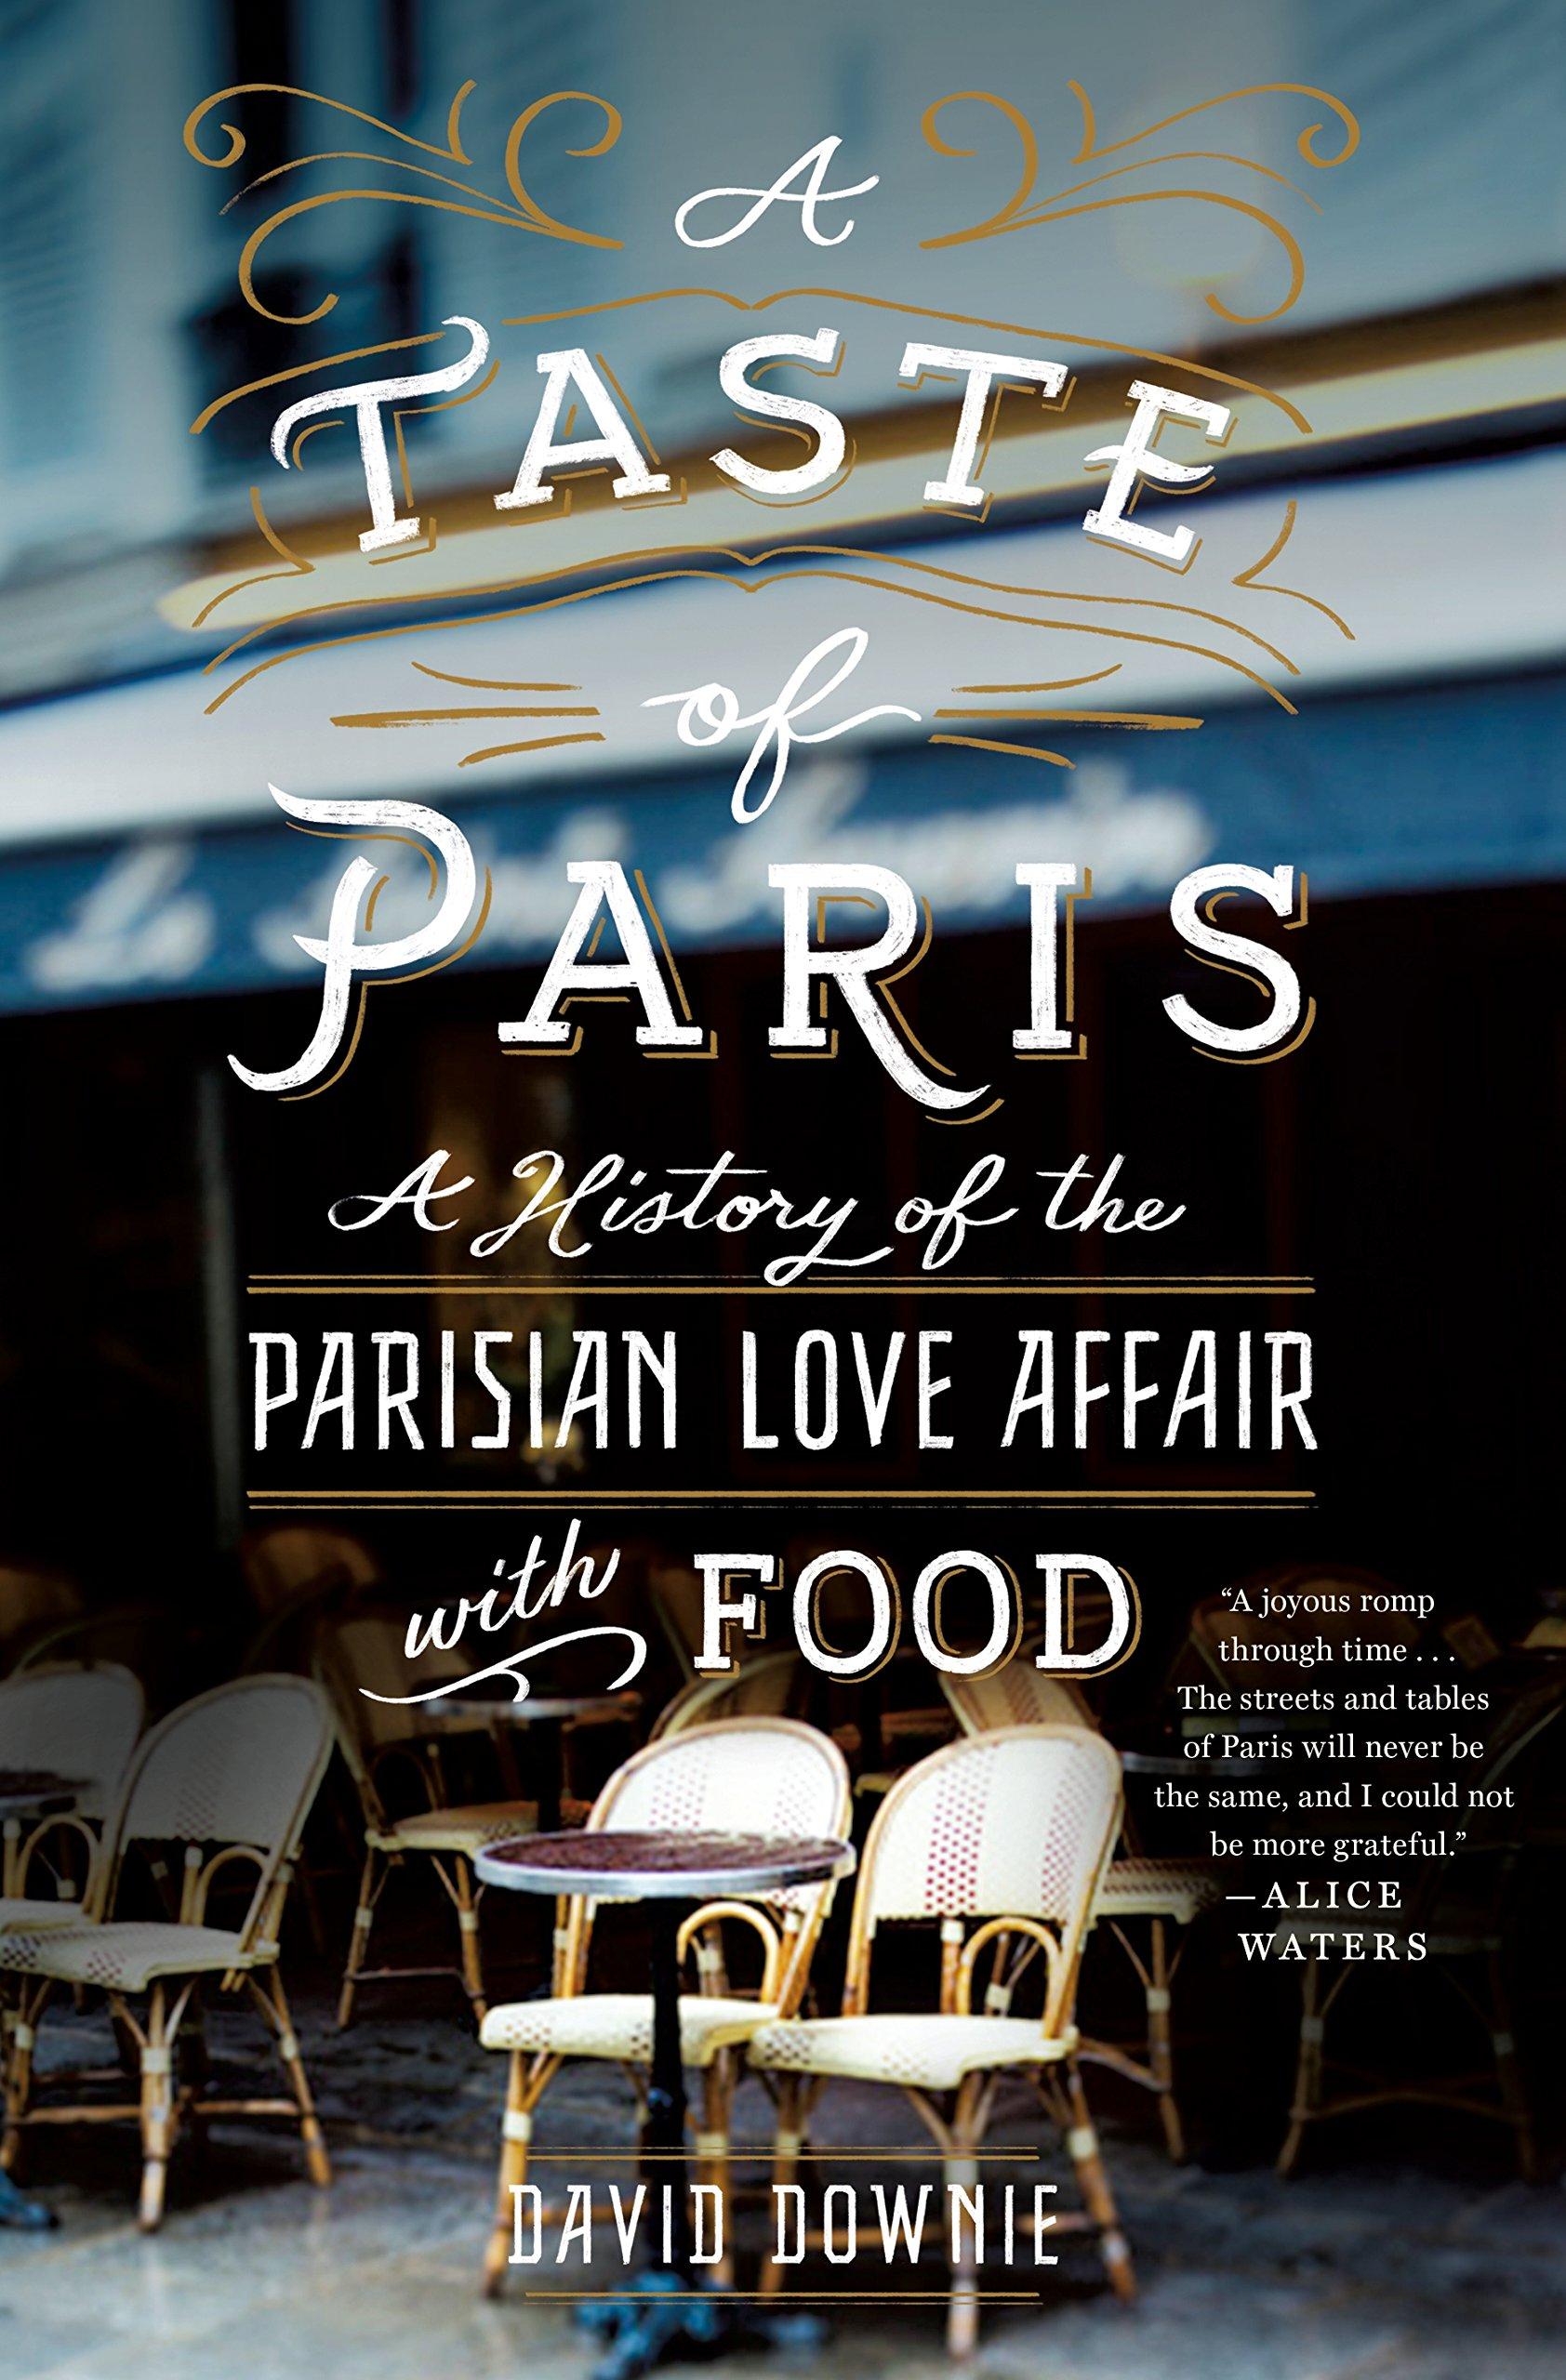 A Taste of Paris A History of the Parisian Love Affair with Food